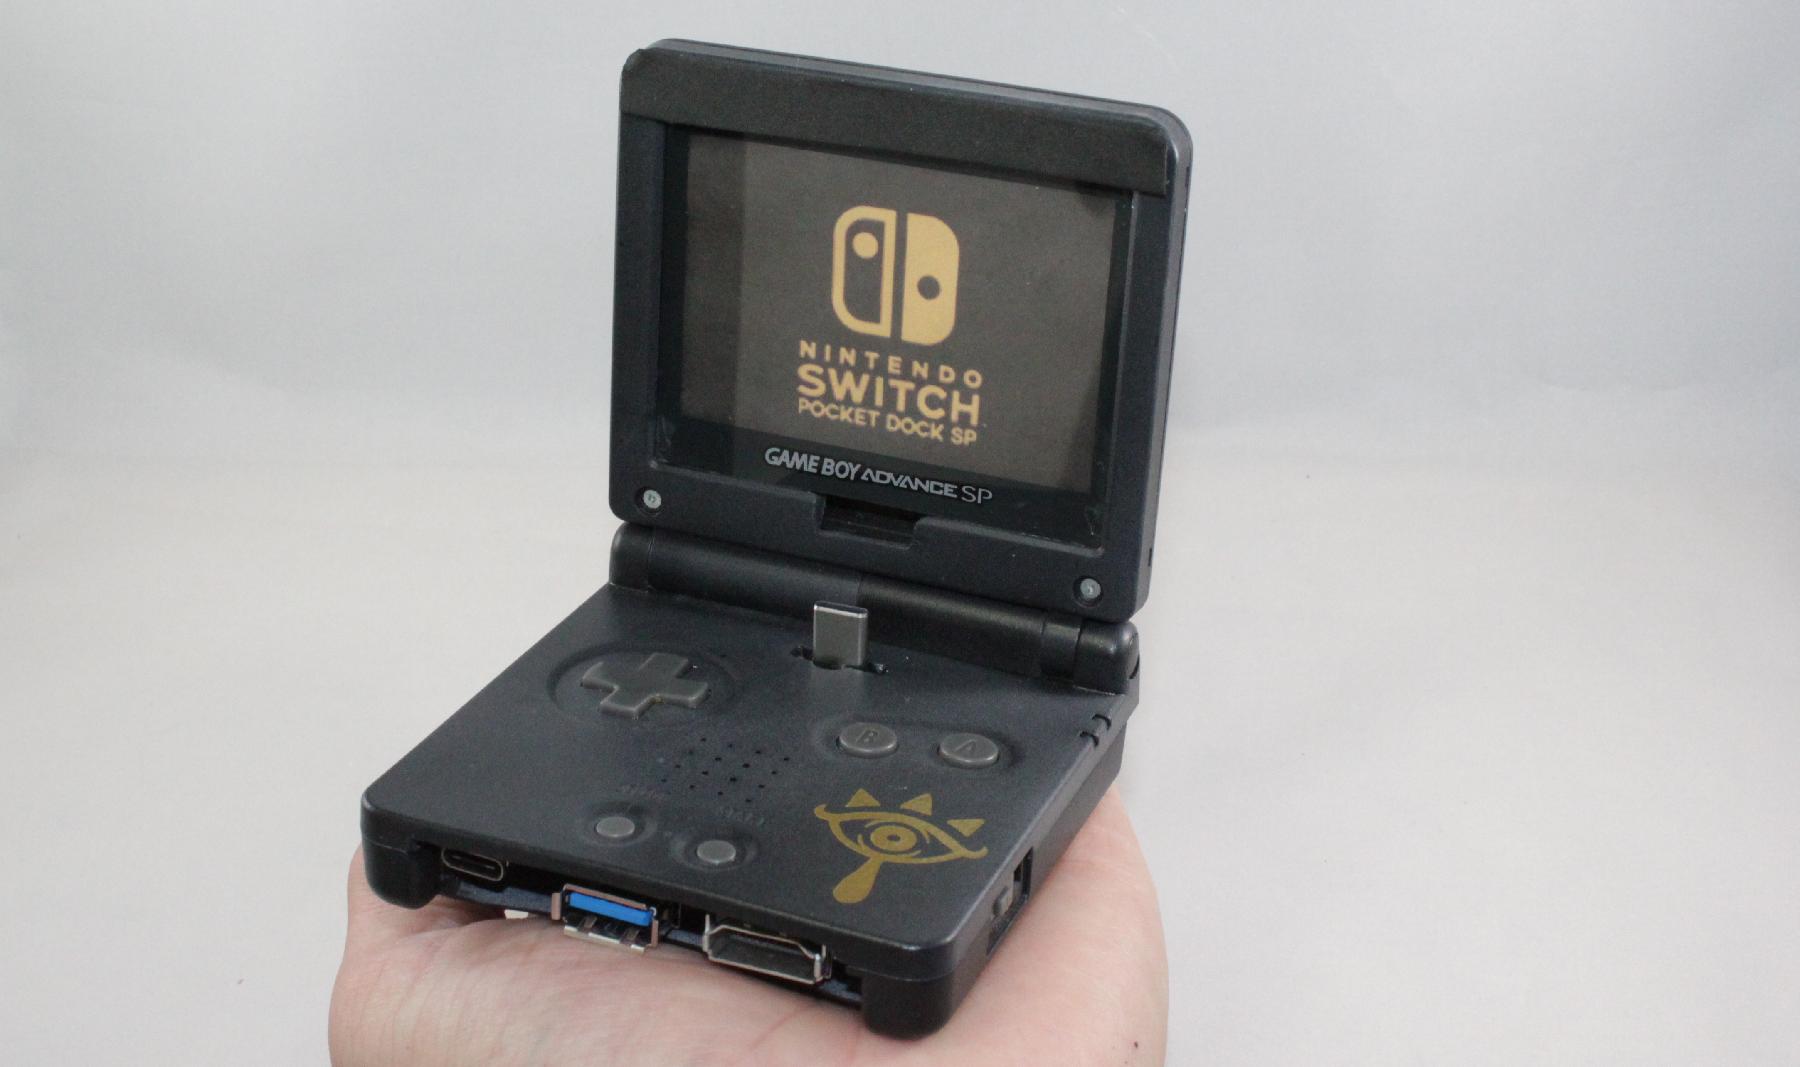 fan transforms old game boy advance sp into a nintendo switch dock